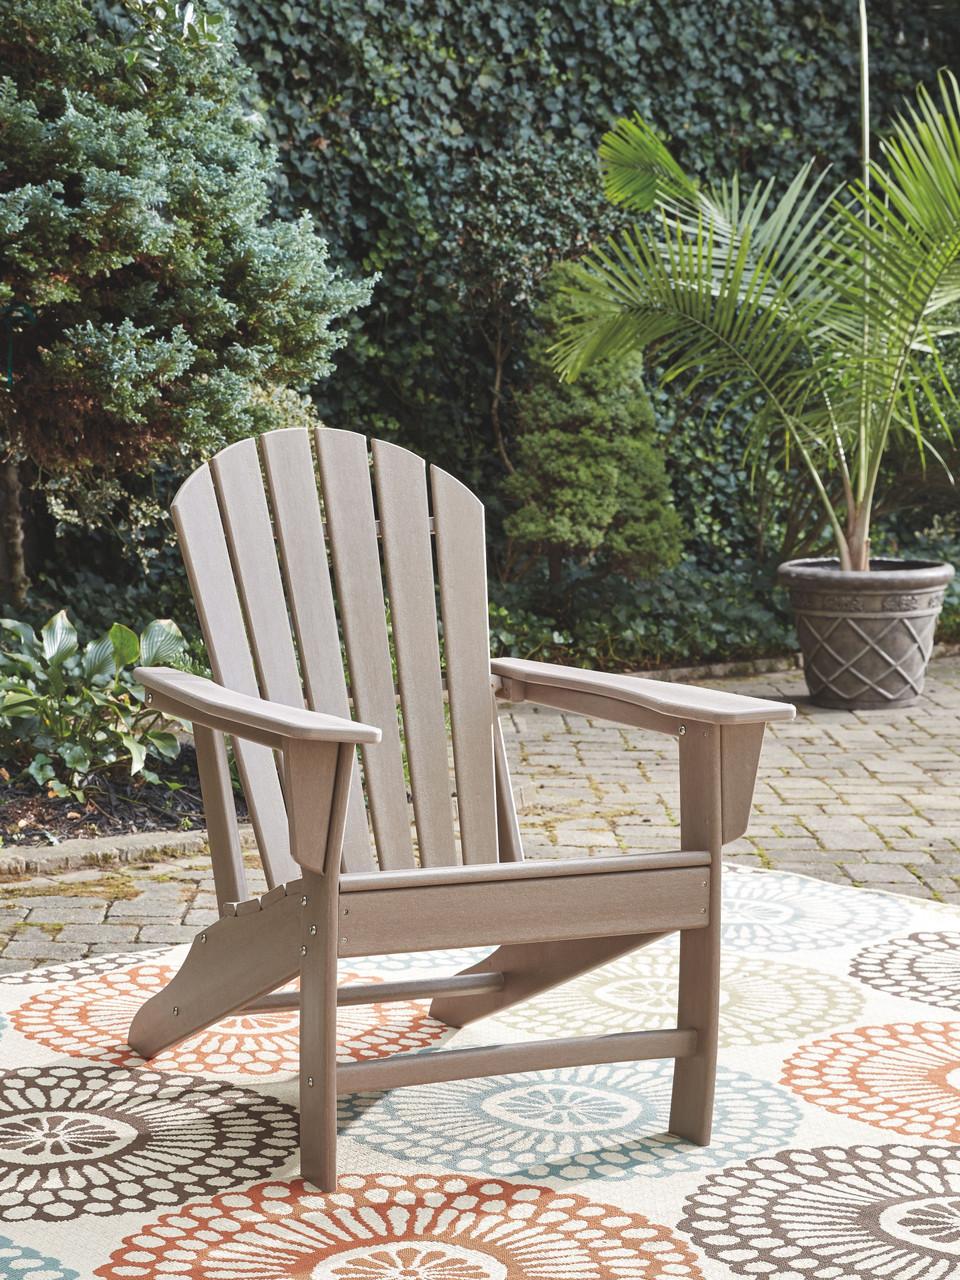 Pleasing Sundown Treasure Grayish Brown Adirondack Chair Gamerscity Chair Design For Home Gamerscityorg